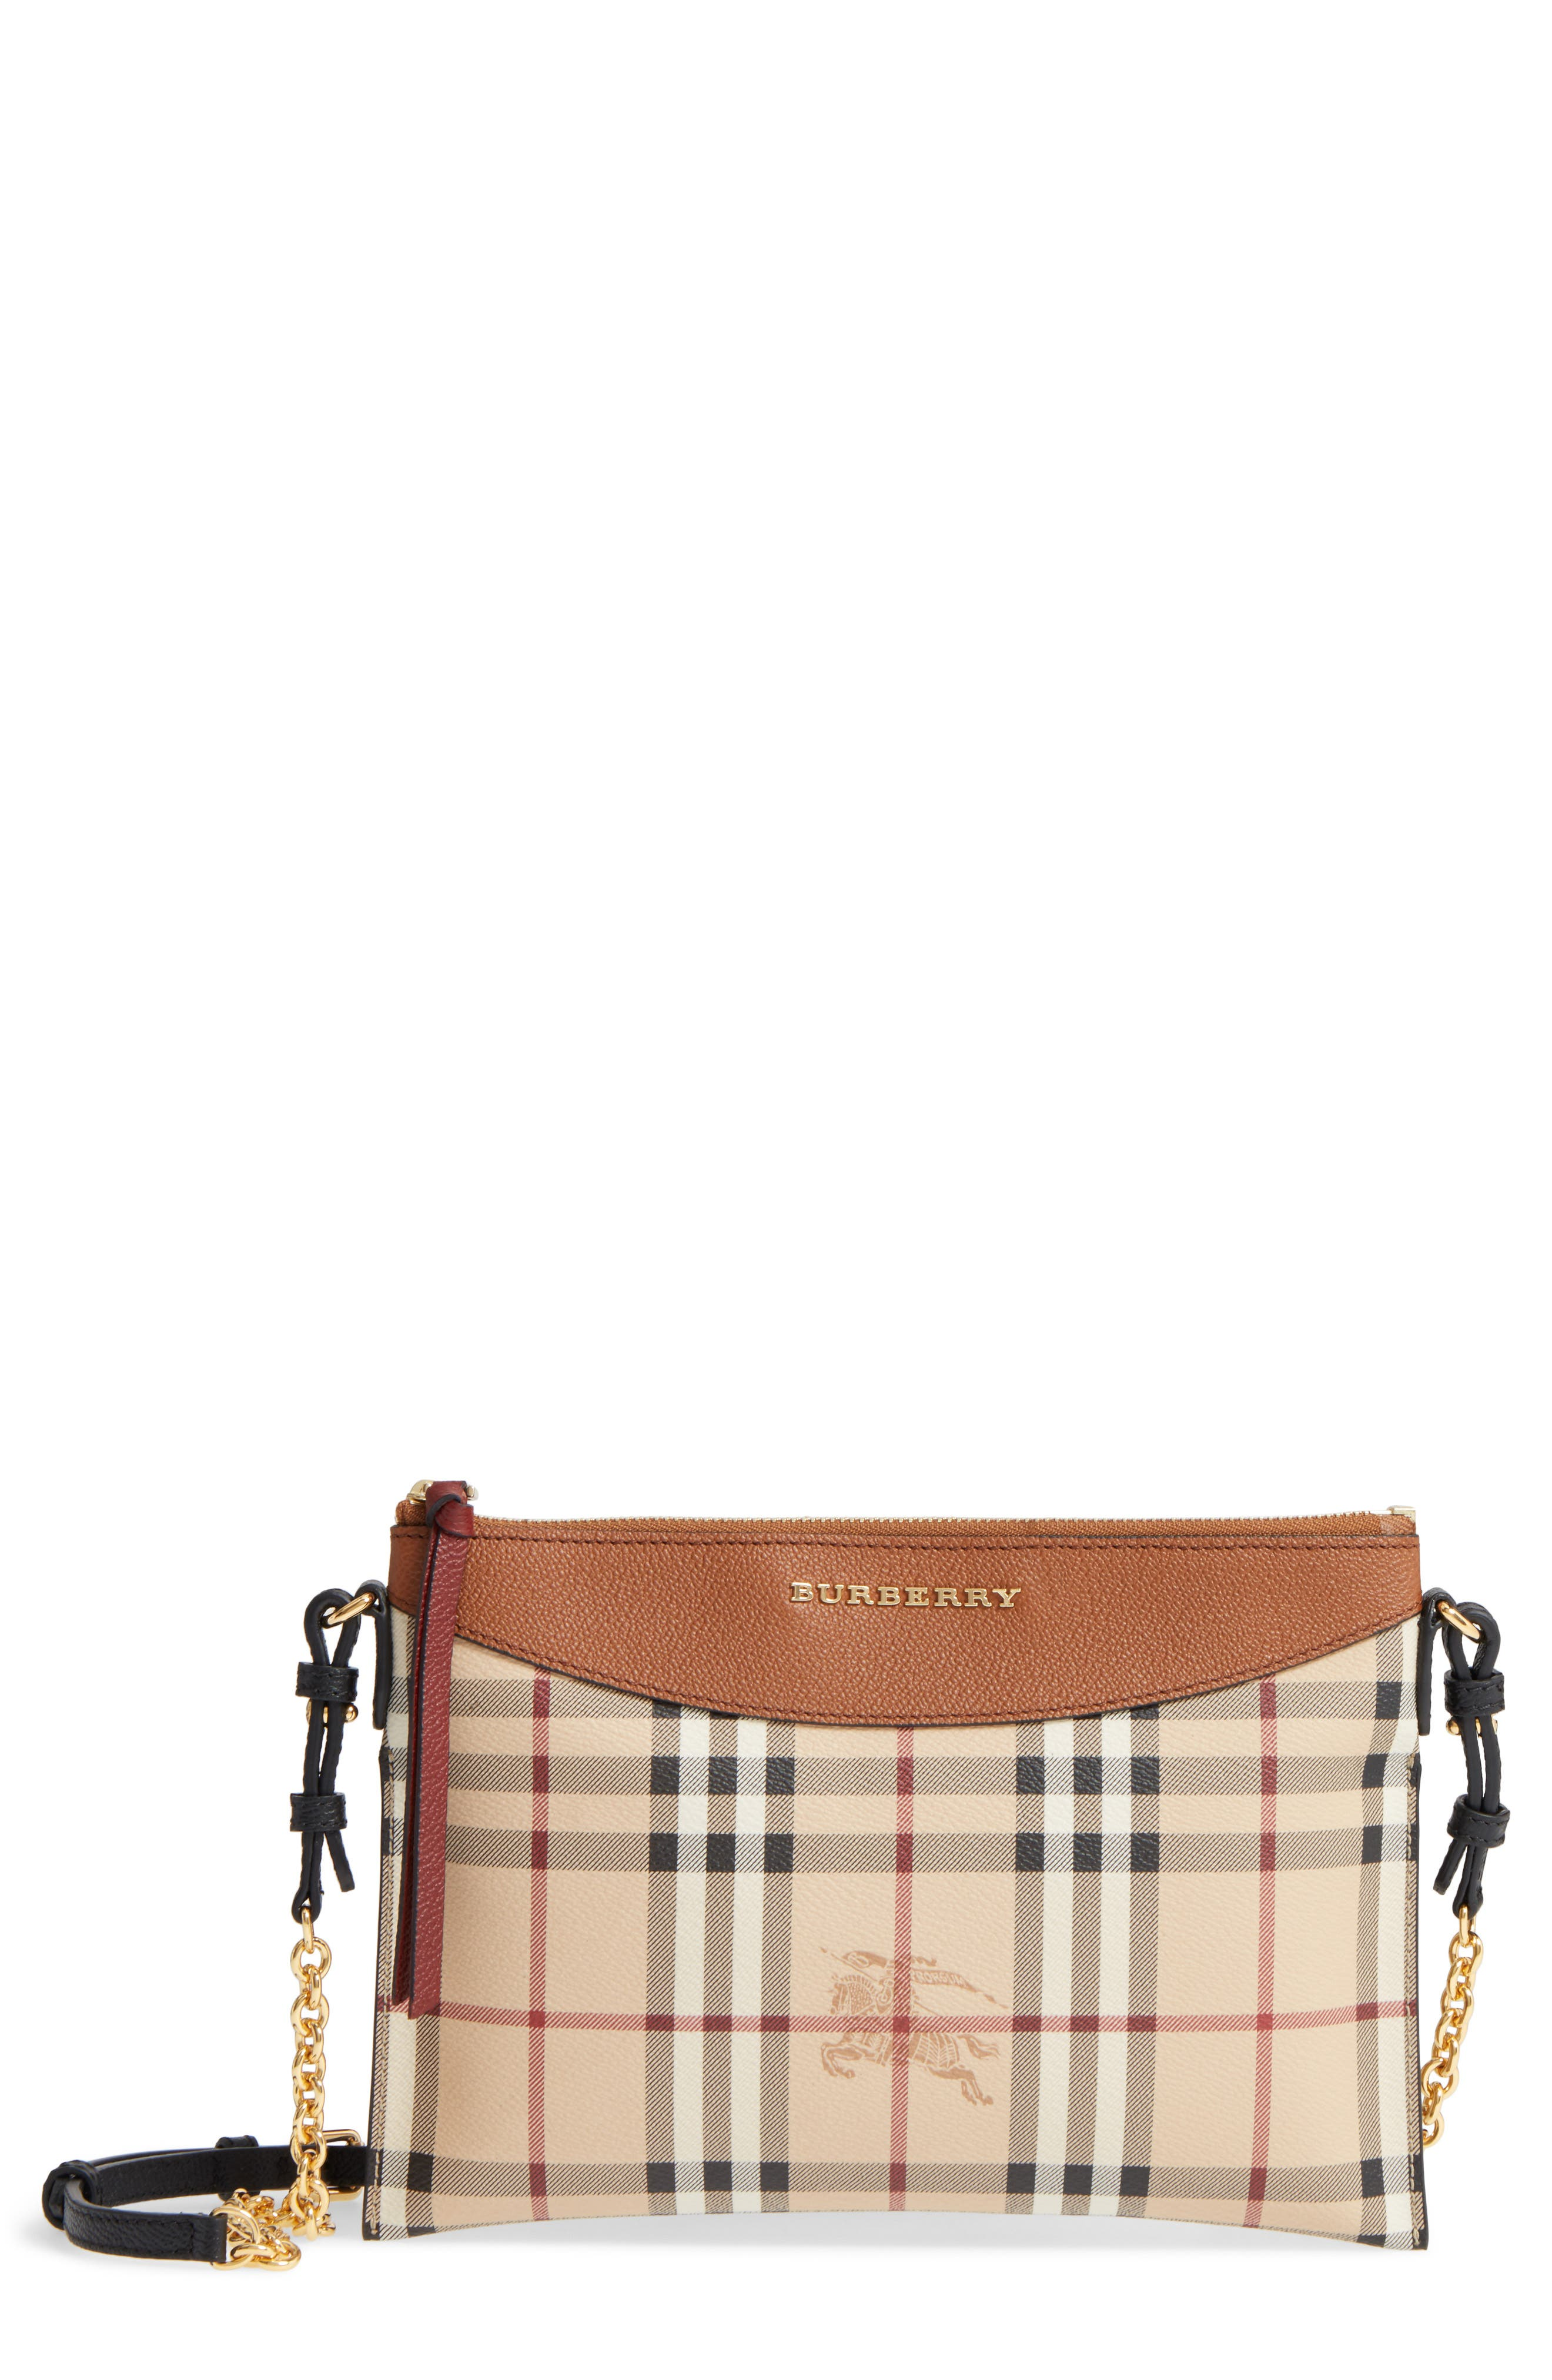 Burberry Peyton - Haymarket Check Coated Canvas Crossbody Bag